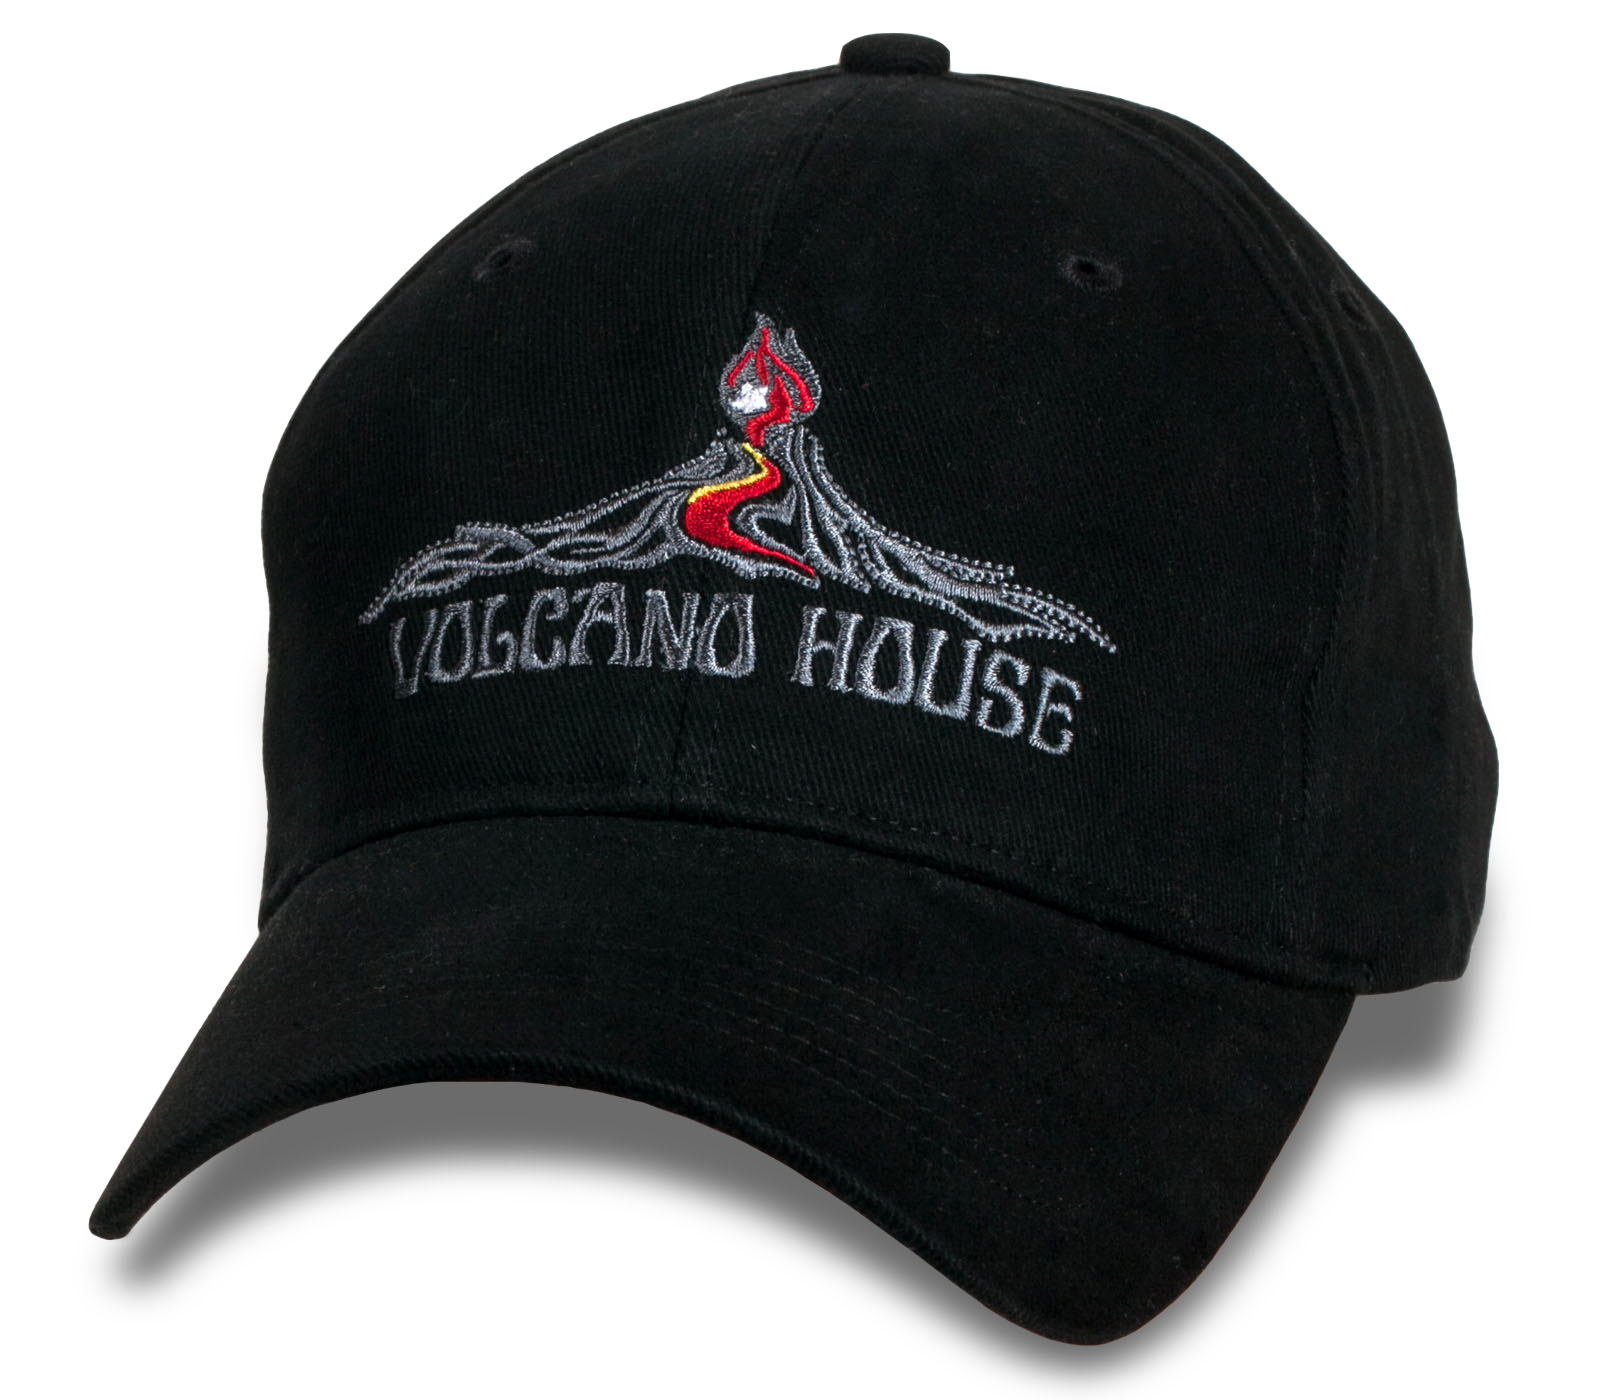 Мужская черная кепка Hawaii Volcano House.